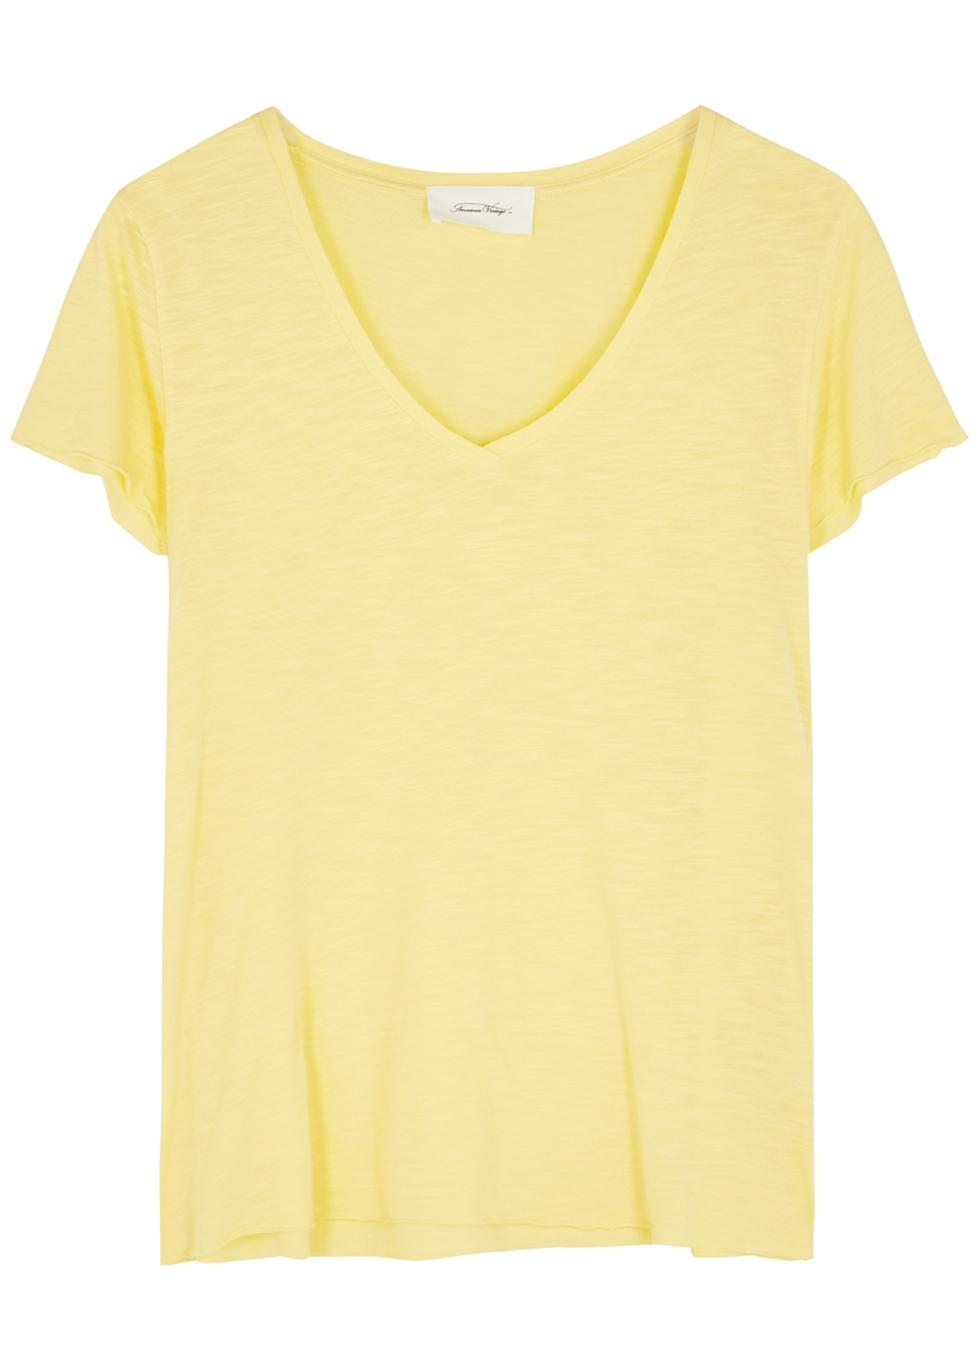 Jacksonville yellow slubbed jersey T-shirt